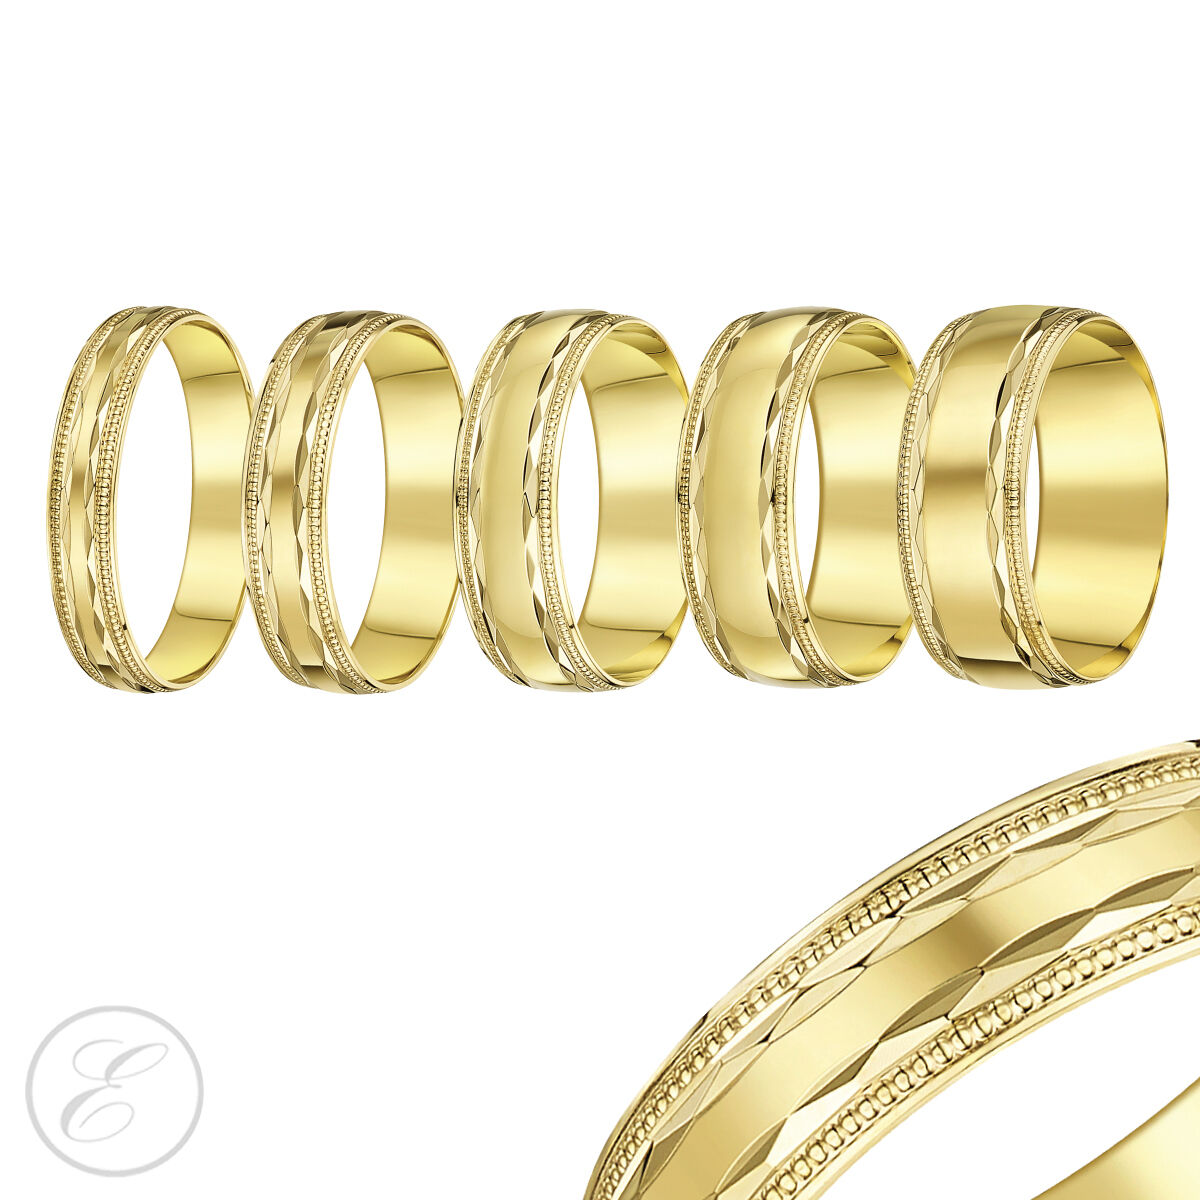 18 Ct Anillo gold yellow Cuenta Diamante Cortar Borde Ligero Forma De D Alianza